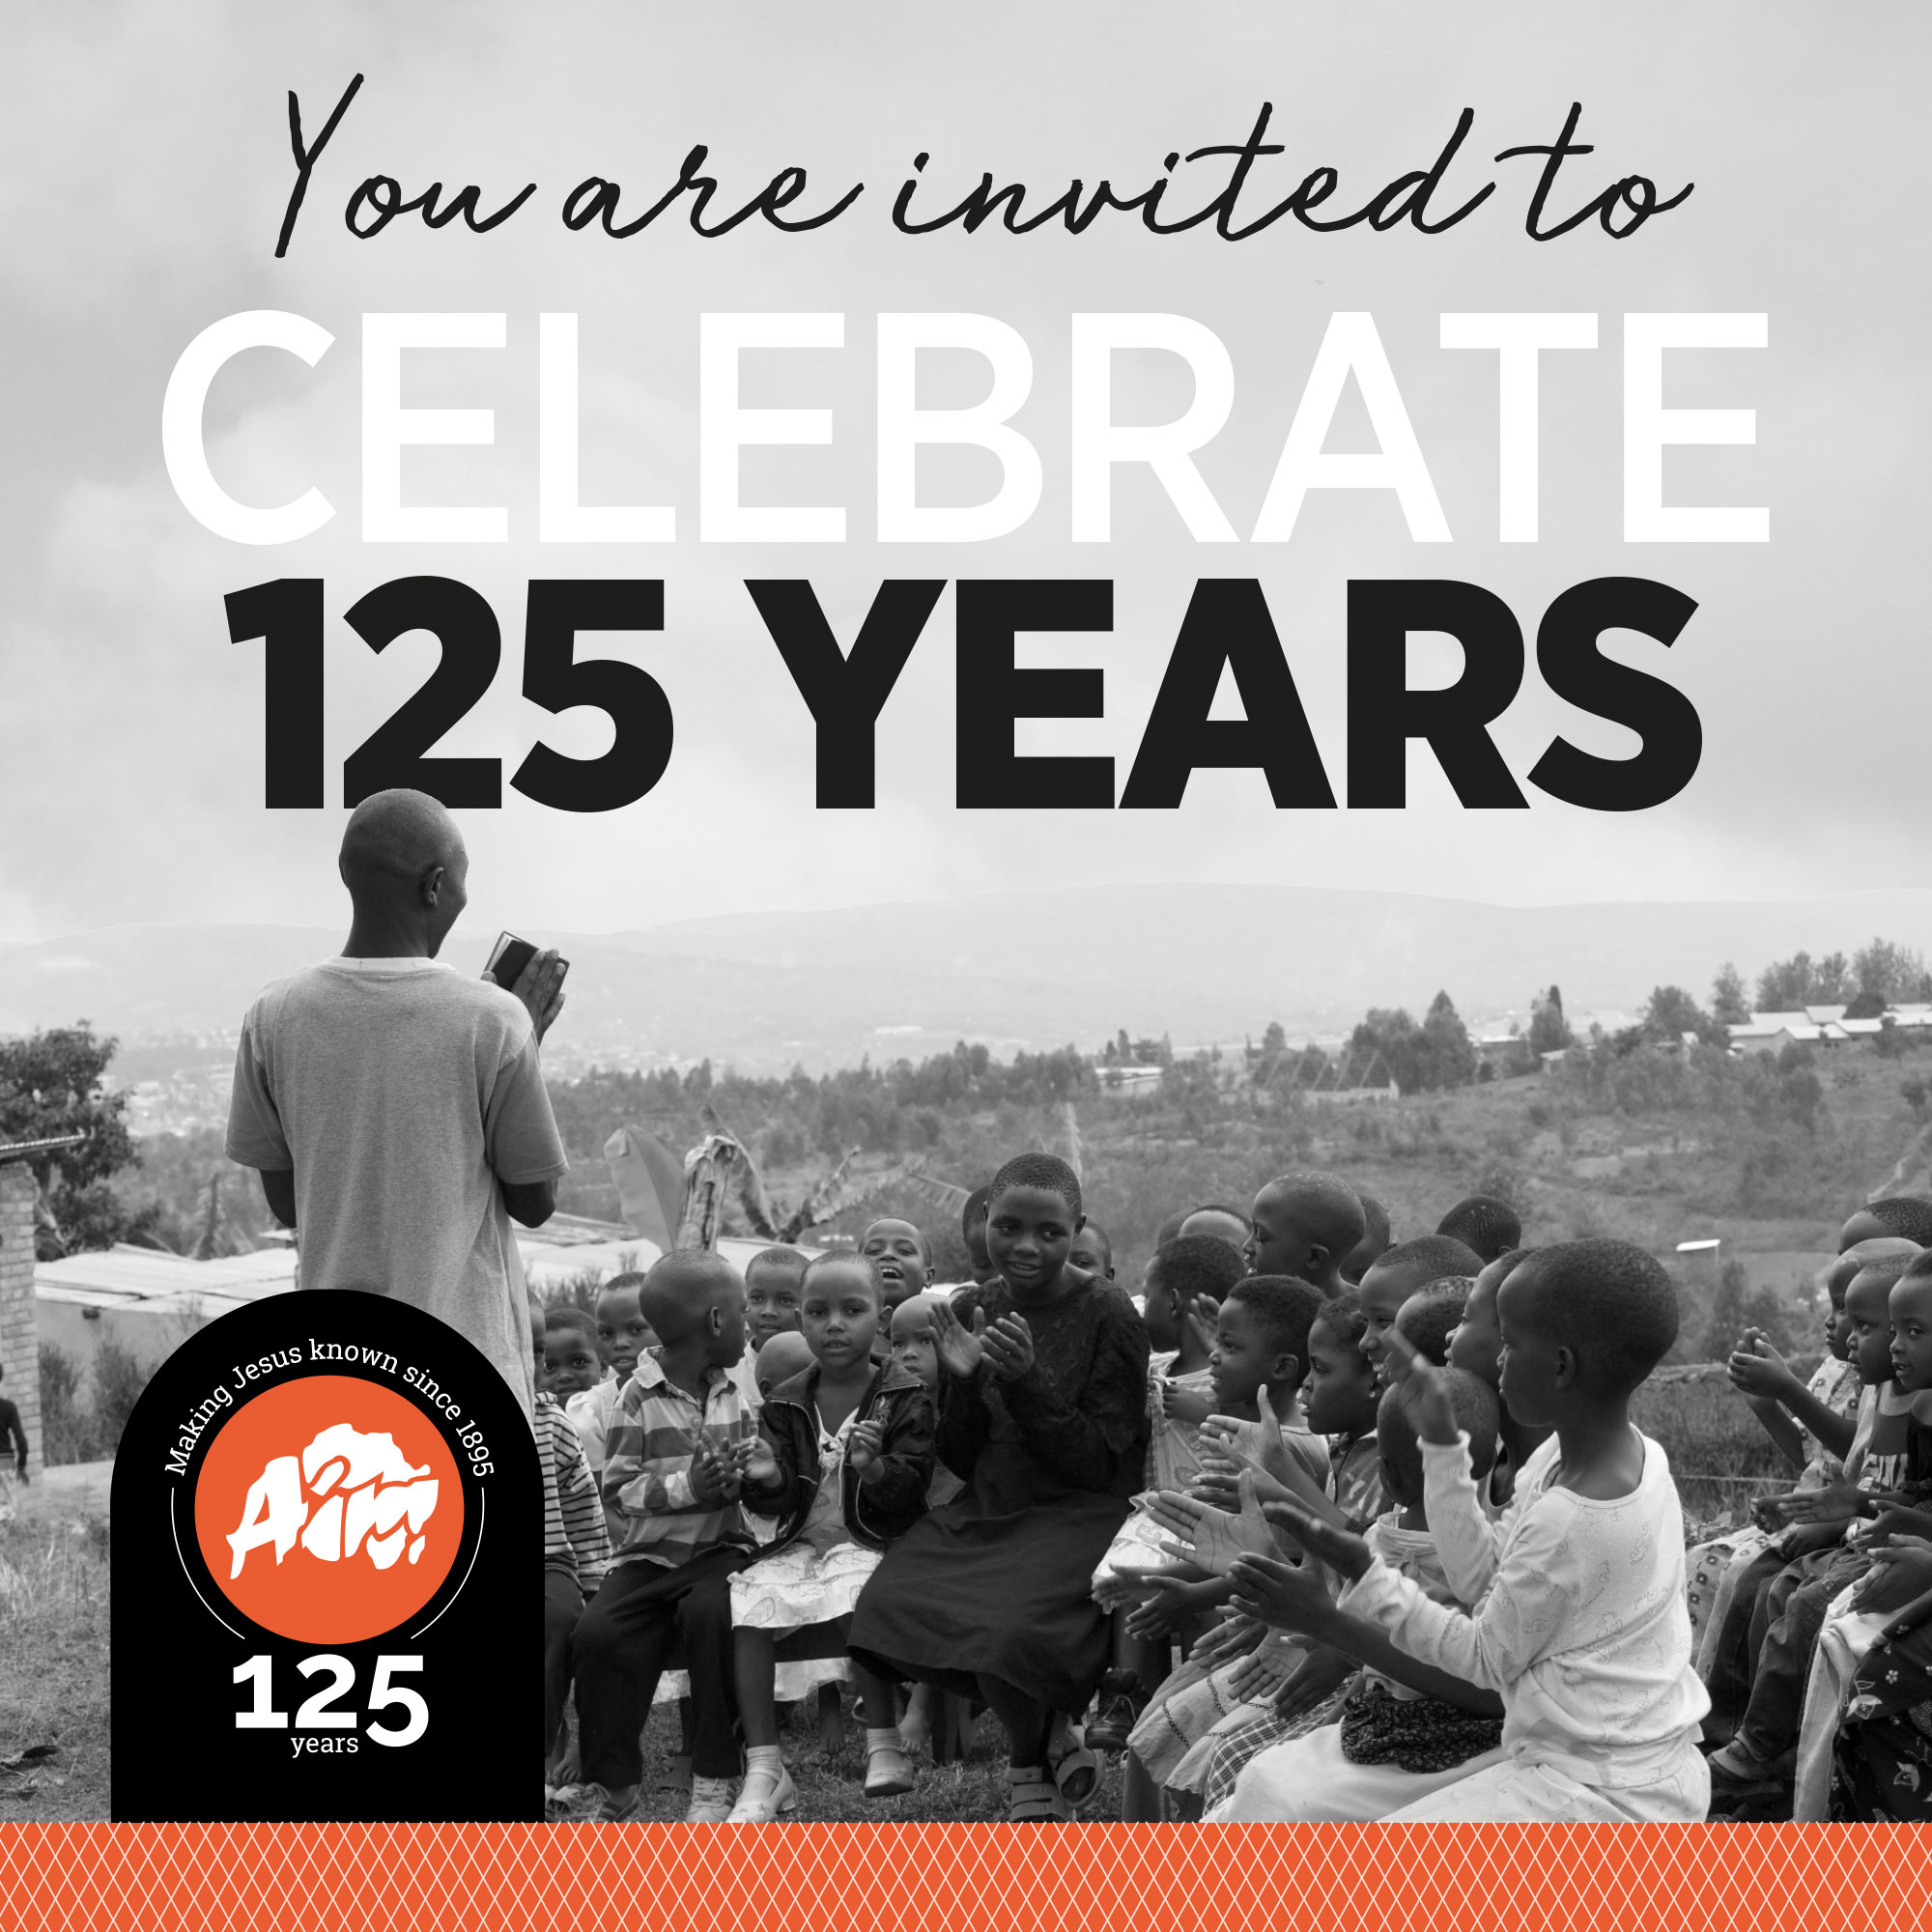 Celebrate 125 years